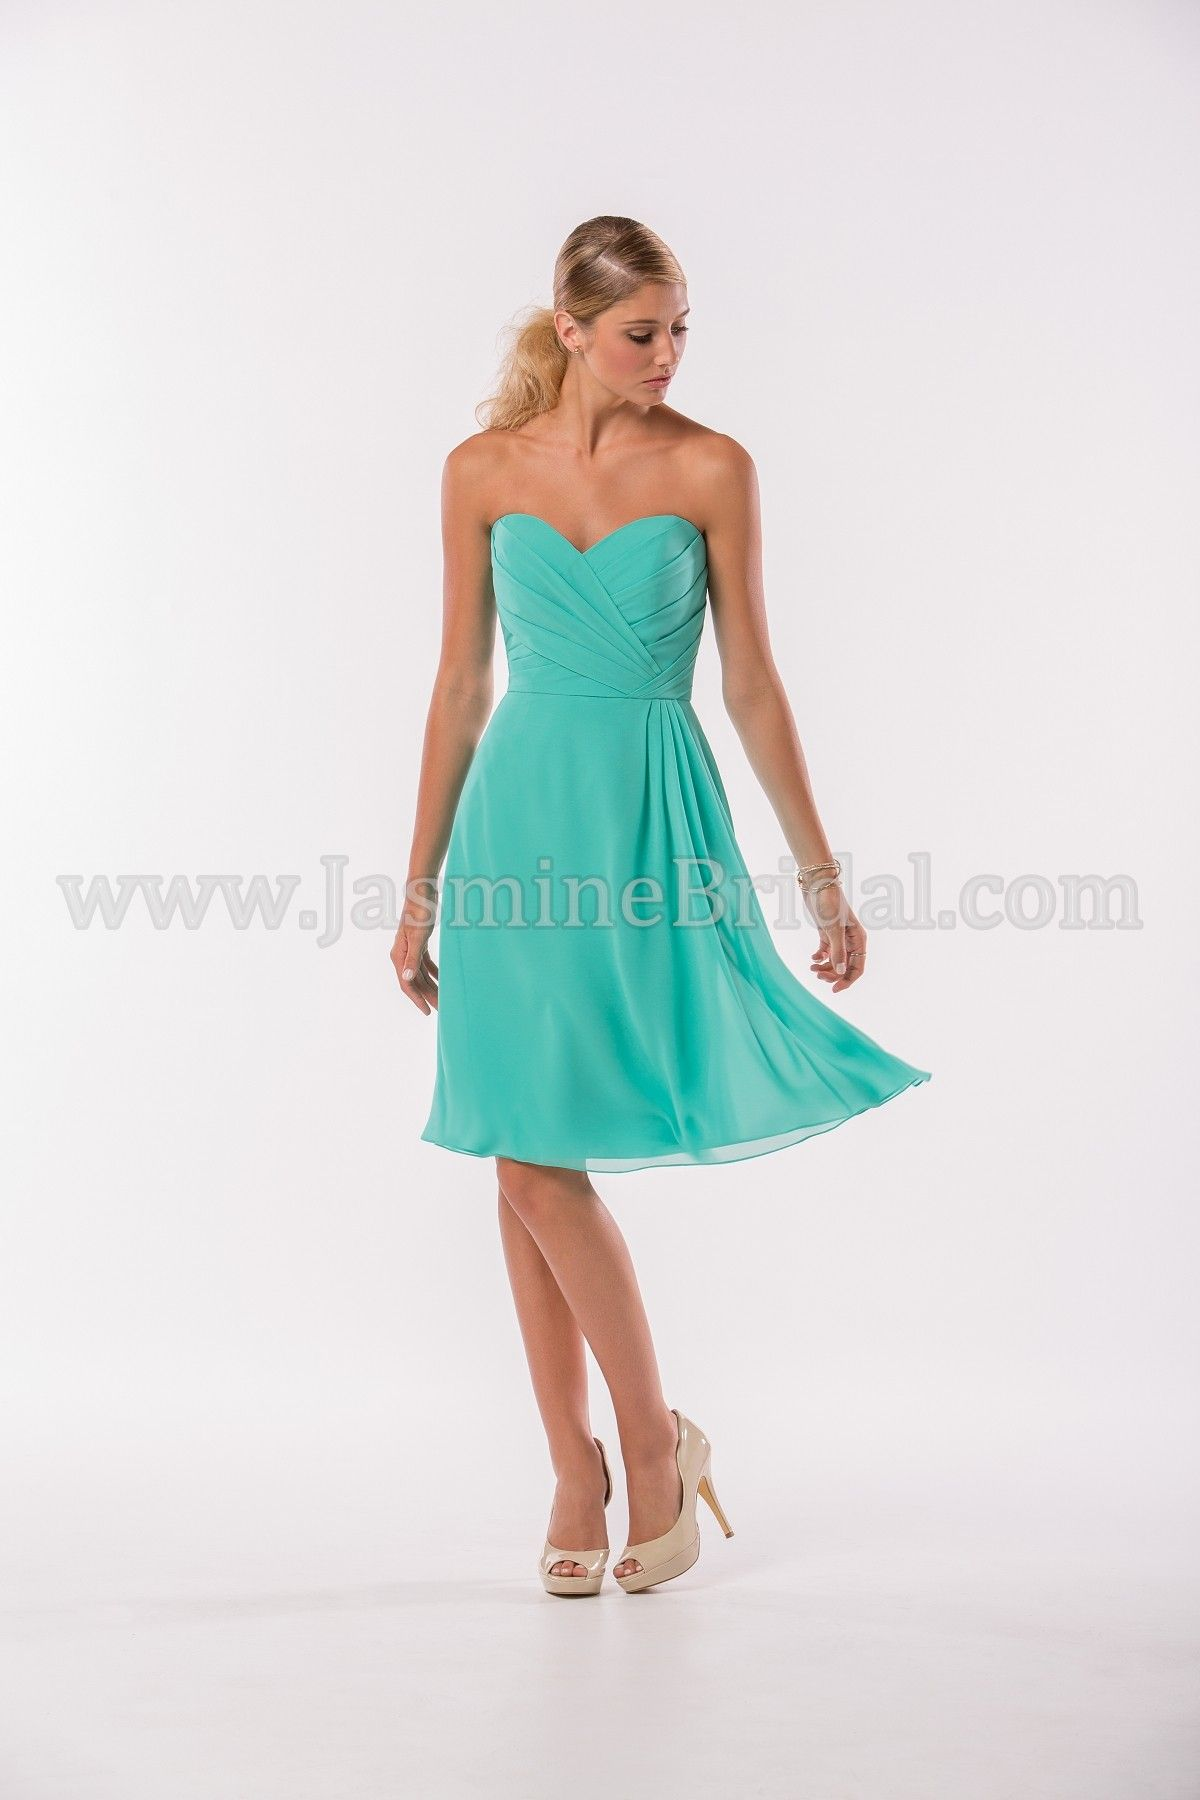 Jasmine Bridal Bridesmaid Dress Jasmine Bridesmaids Style P186012K ...